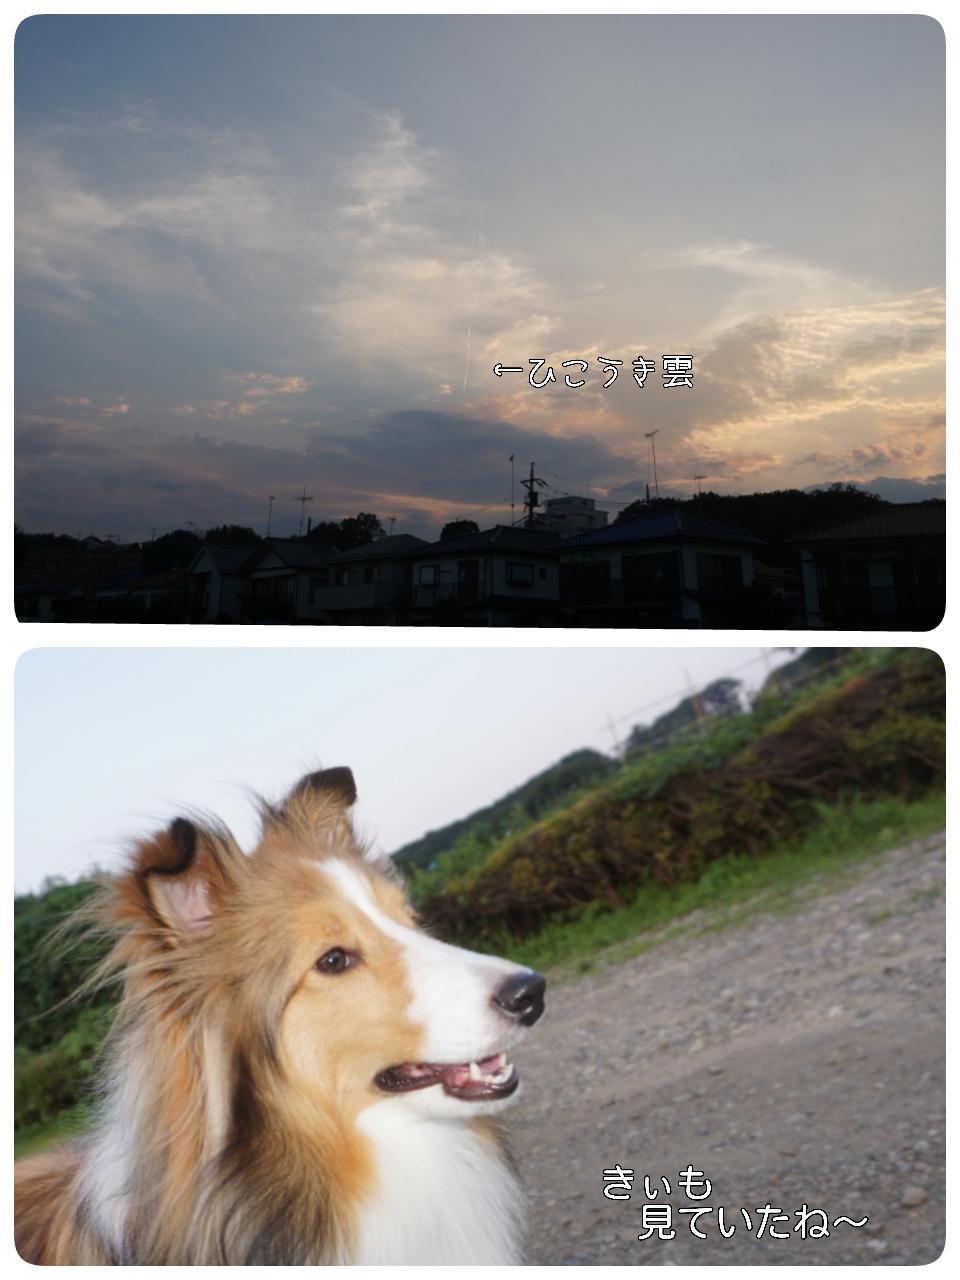 2015-06-24-22-08-38_deco.jpg